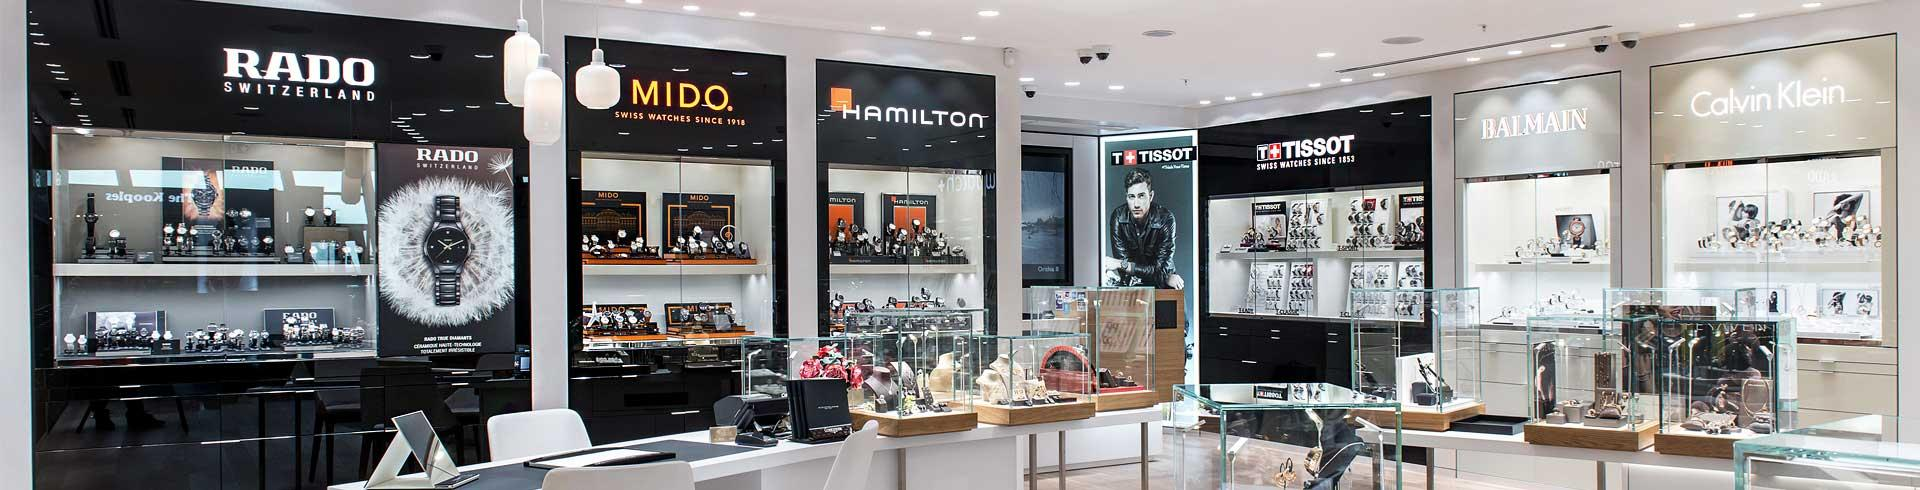 hour passion horlogerie joaillerie terminal 2 boutiques services la promenade nice. Black Bedroom Furniture Sets. Home Design Ideas